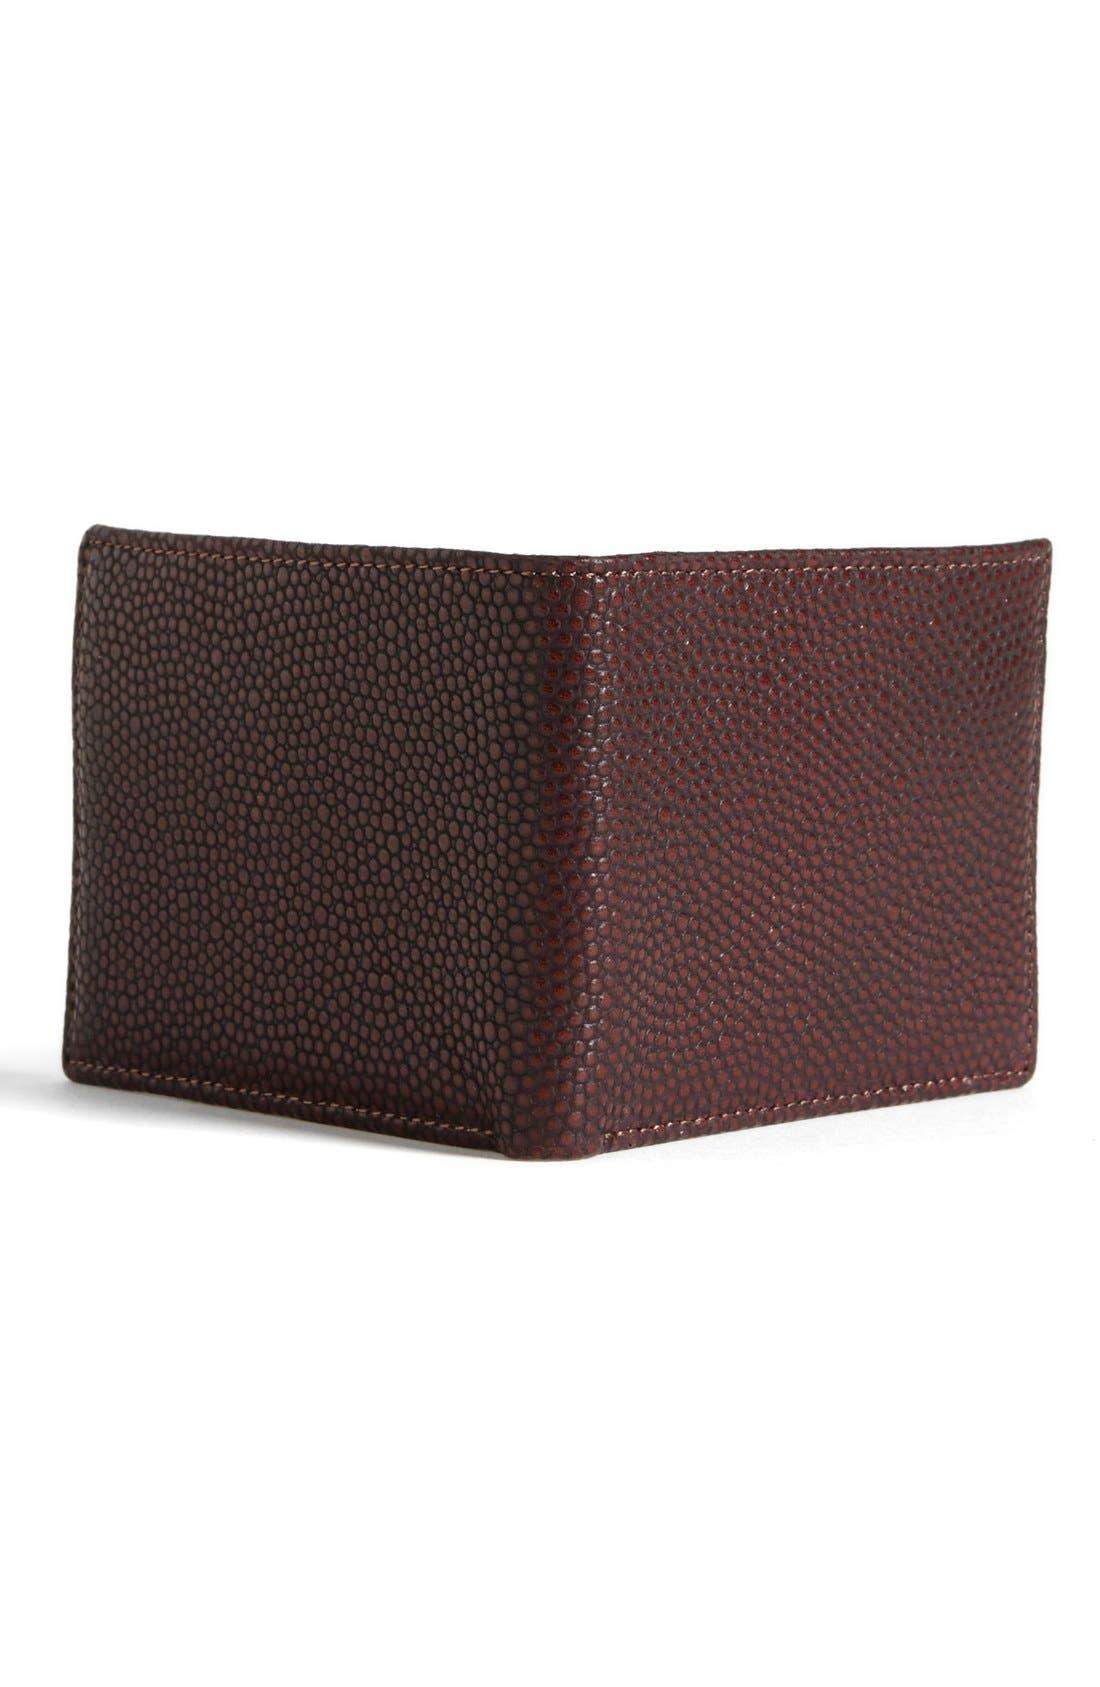 Alternate Image 3  - John Varvatos Collection Pebbled Leather Wallet